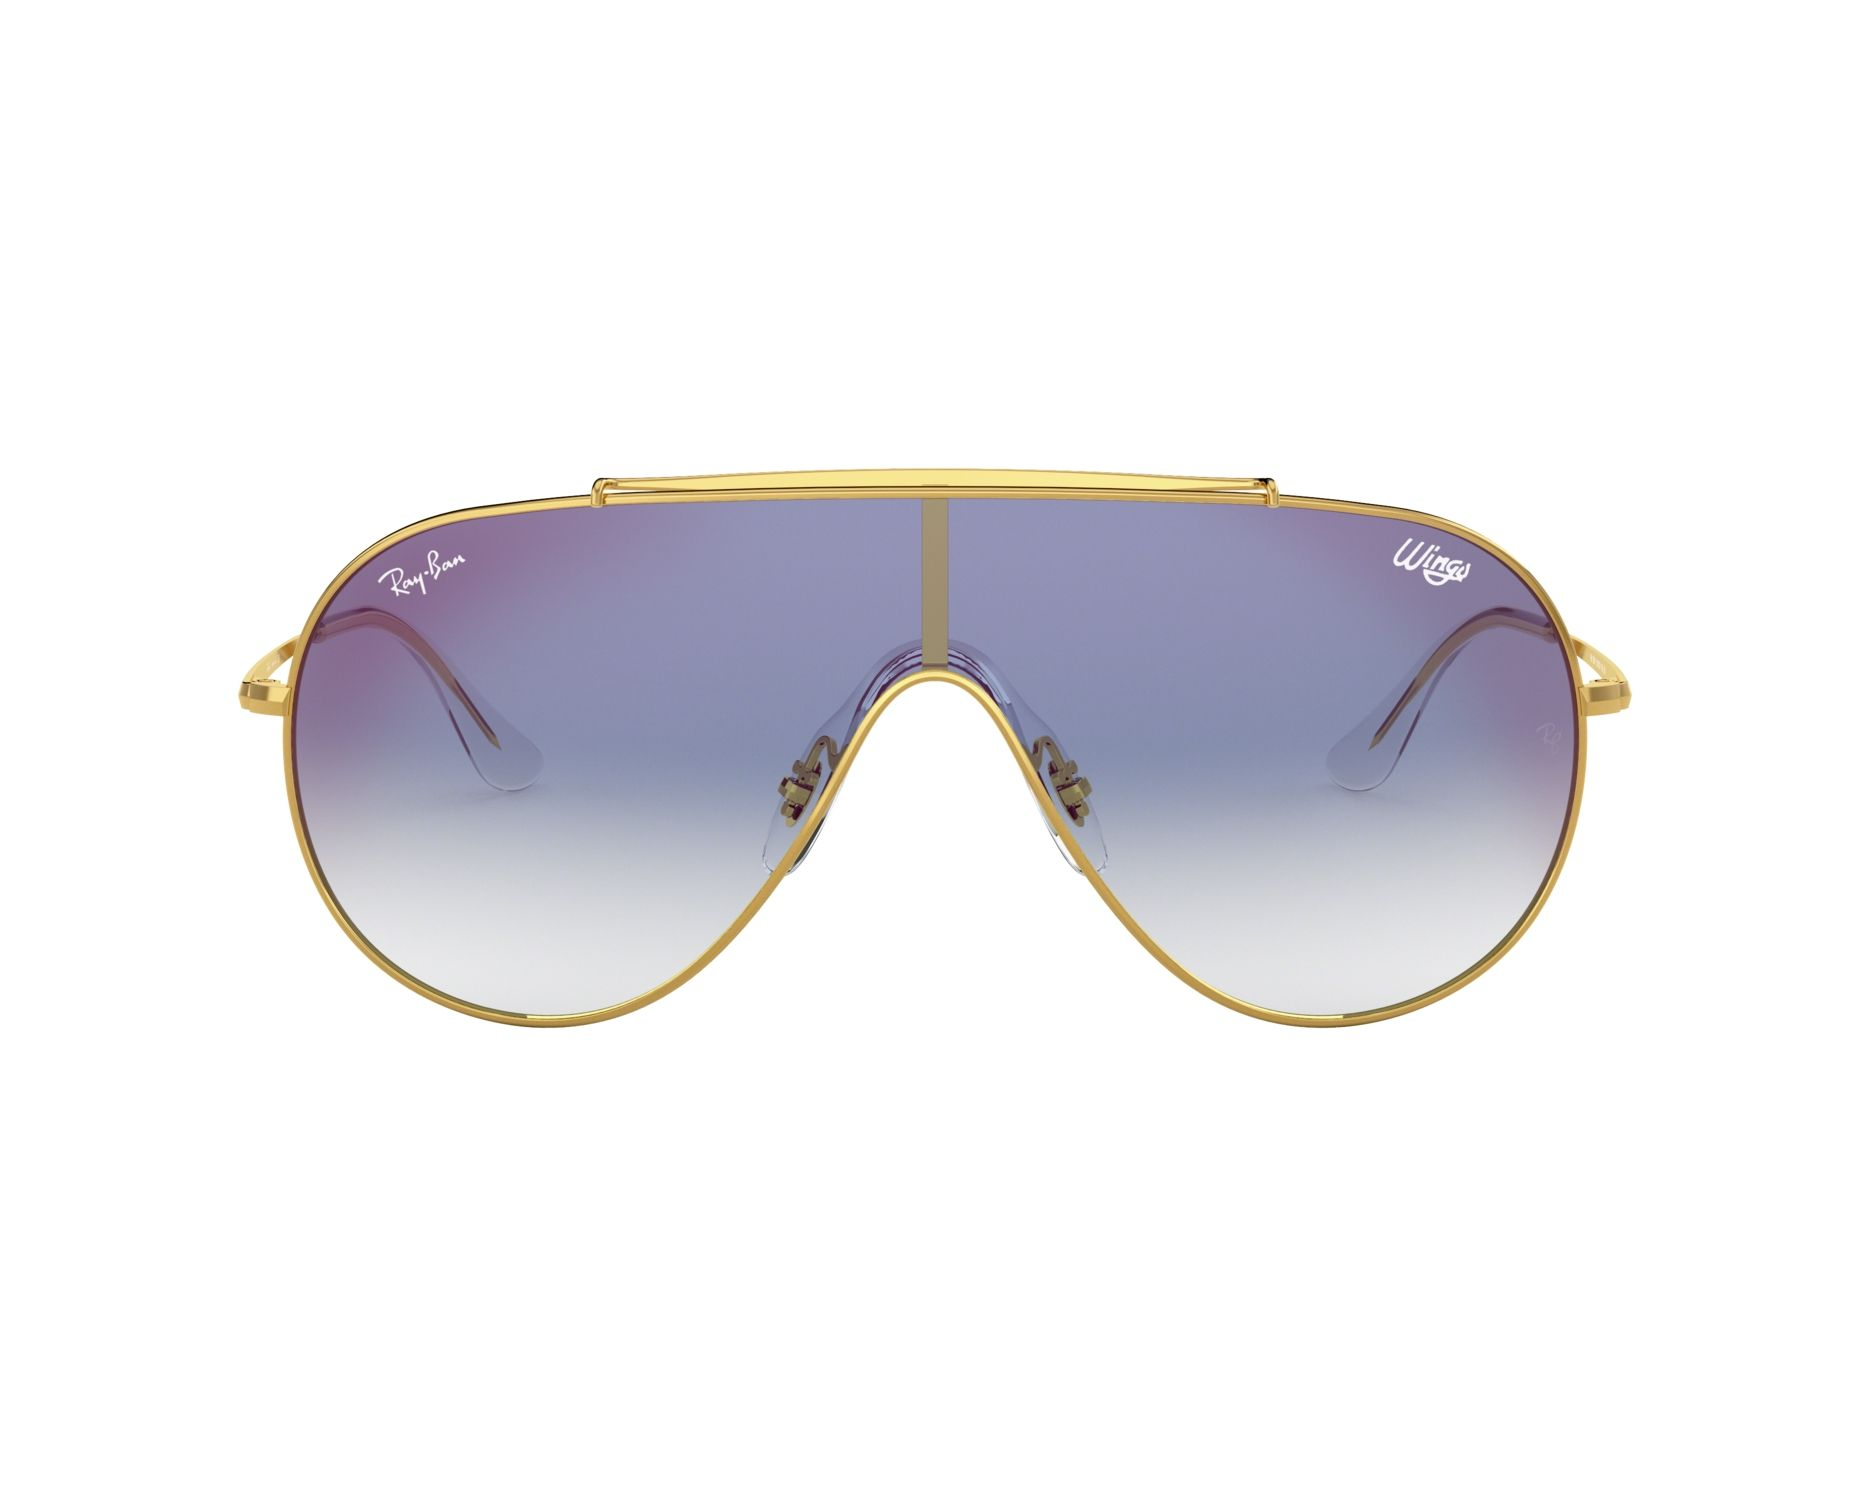 8c8c56b18e Sunglasses Ray-Ban RB-3597 001 X0 65-18 Gold 360 degree